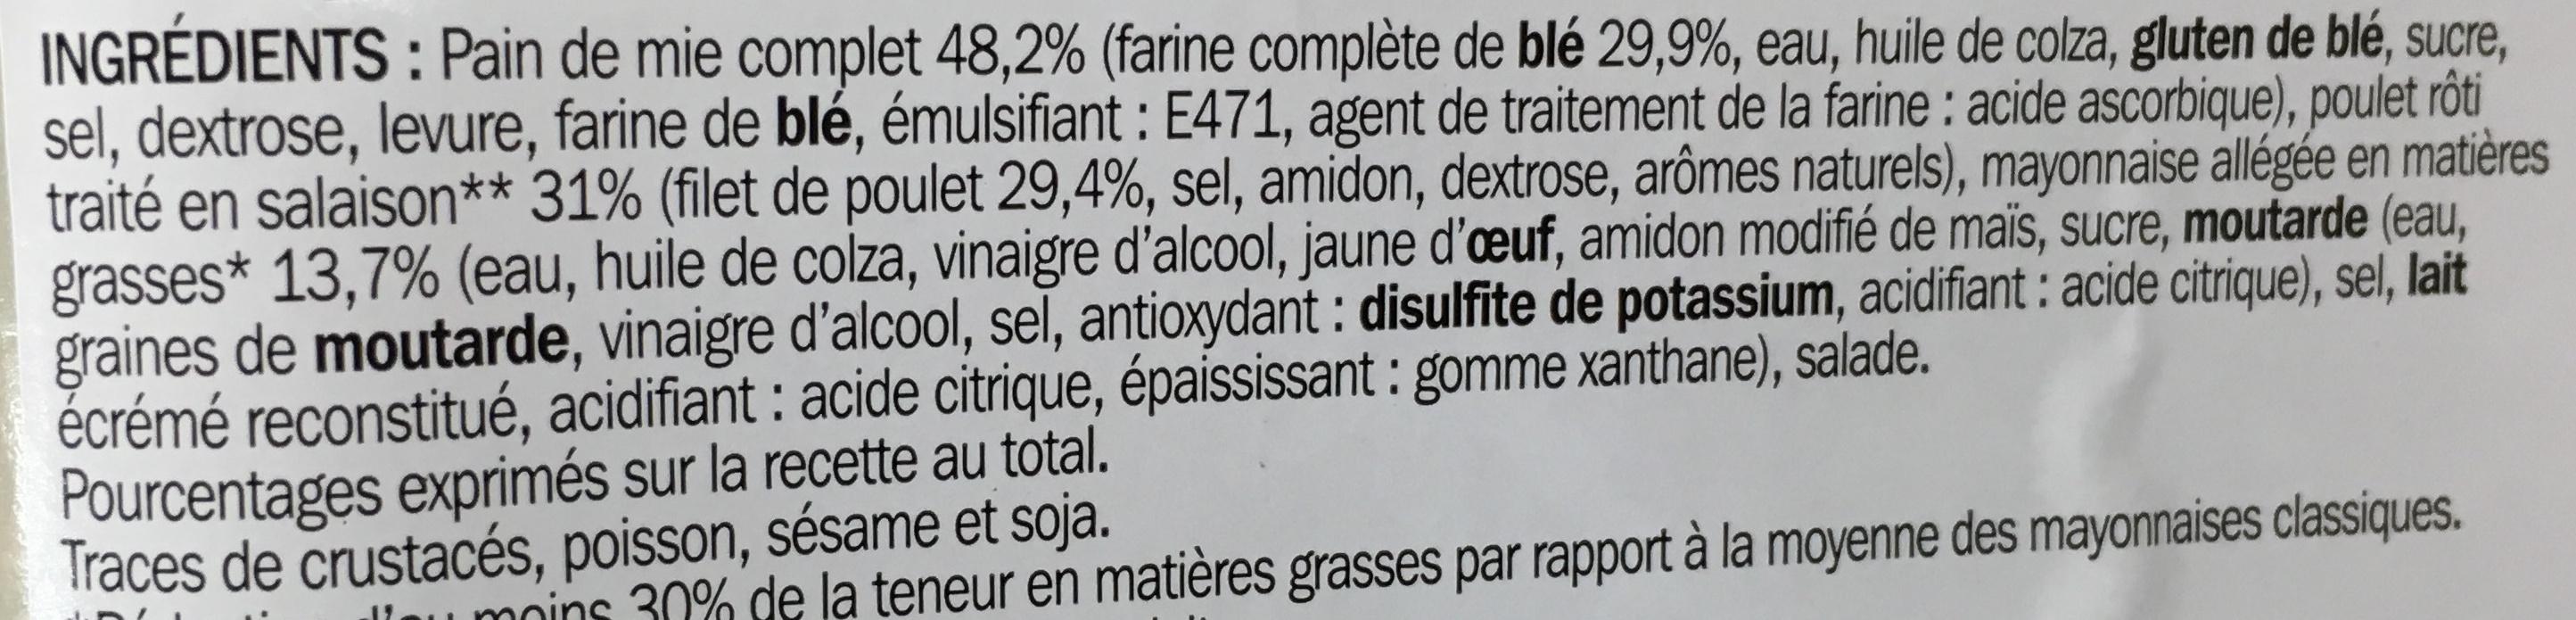 Sandwich club poulet rôti mayonnaise allégée - Ingrediënten - fr